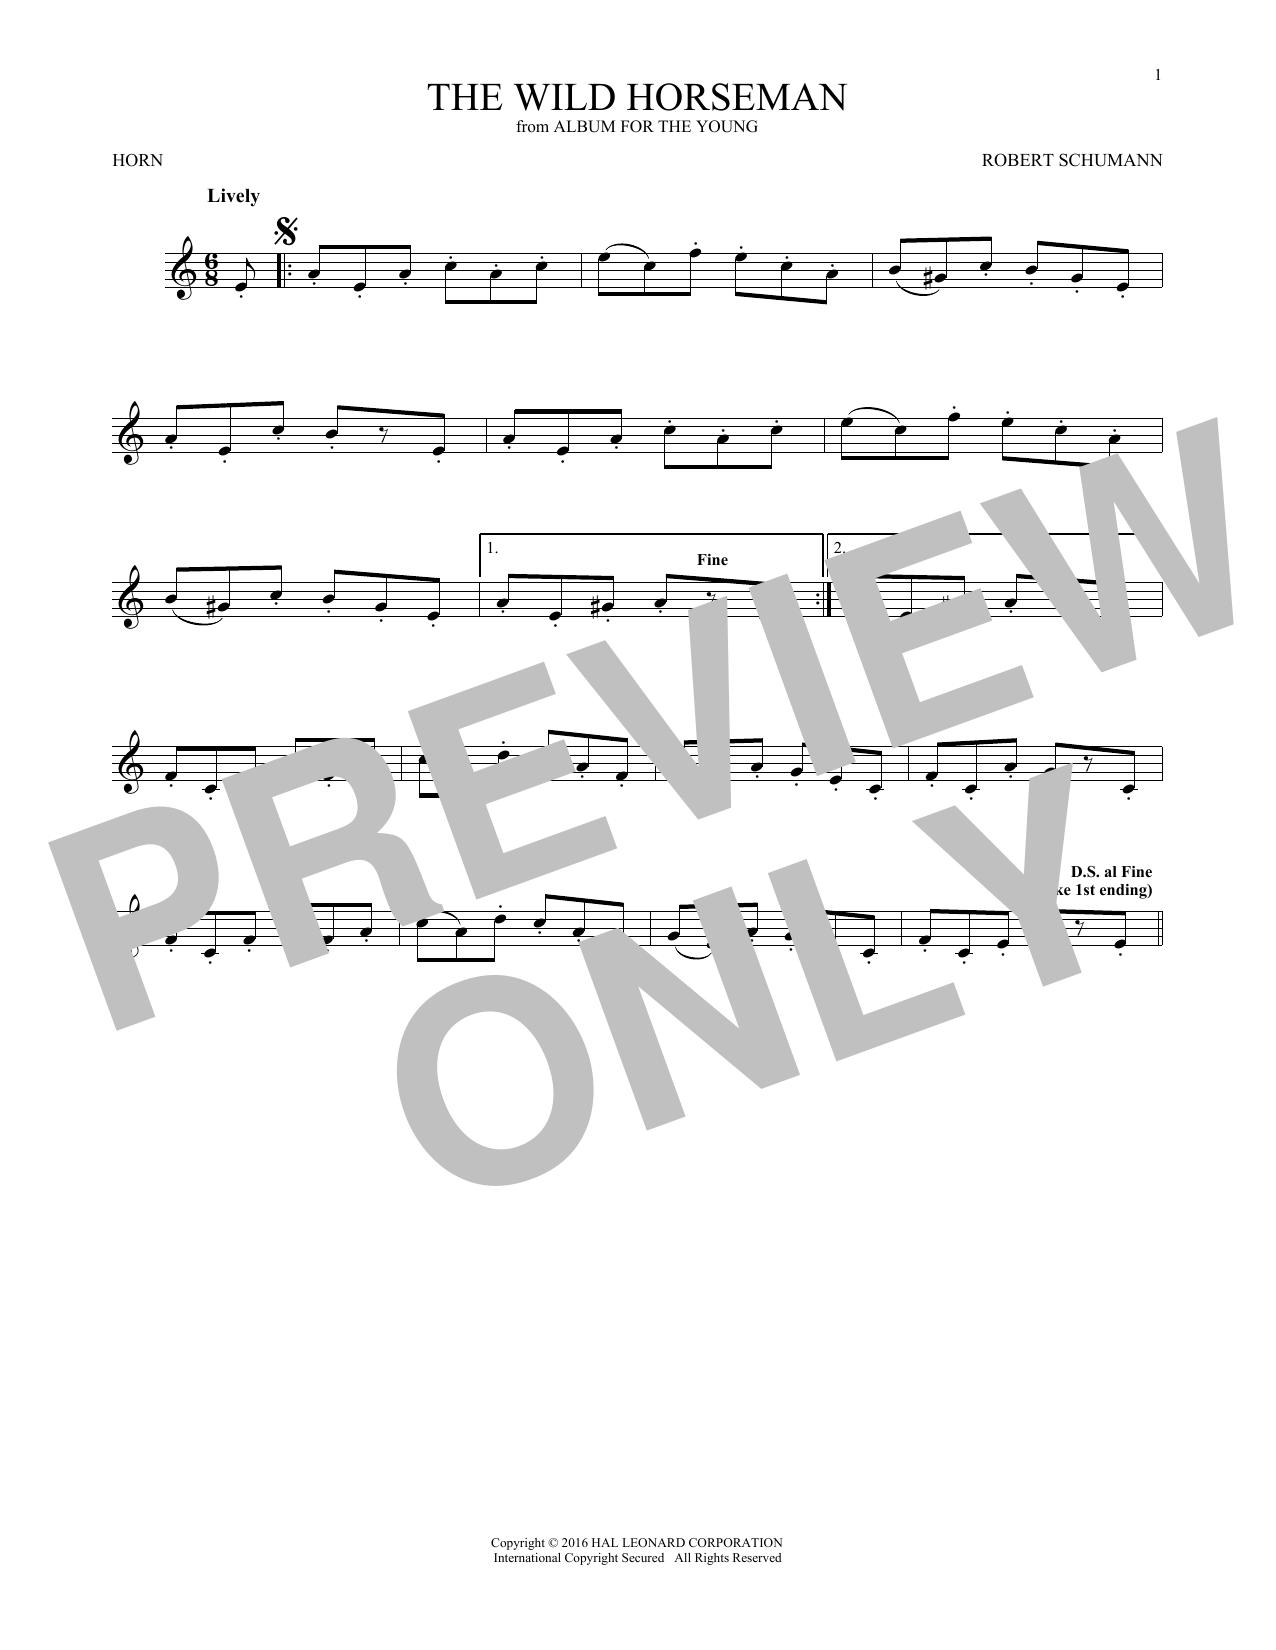 The Wild Horseman (Wilder Reiter), Op. 68, No. 8 (French Horn Solo)